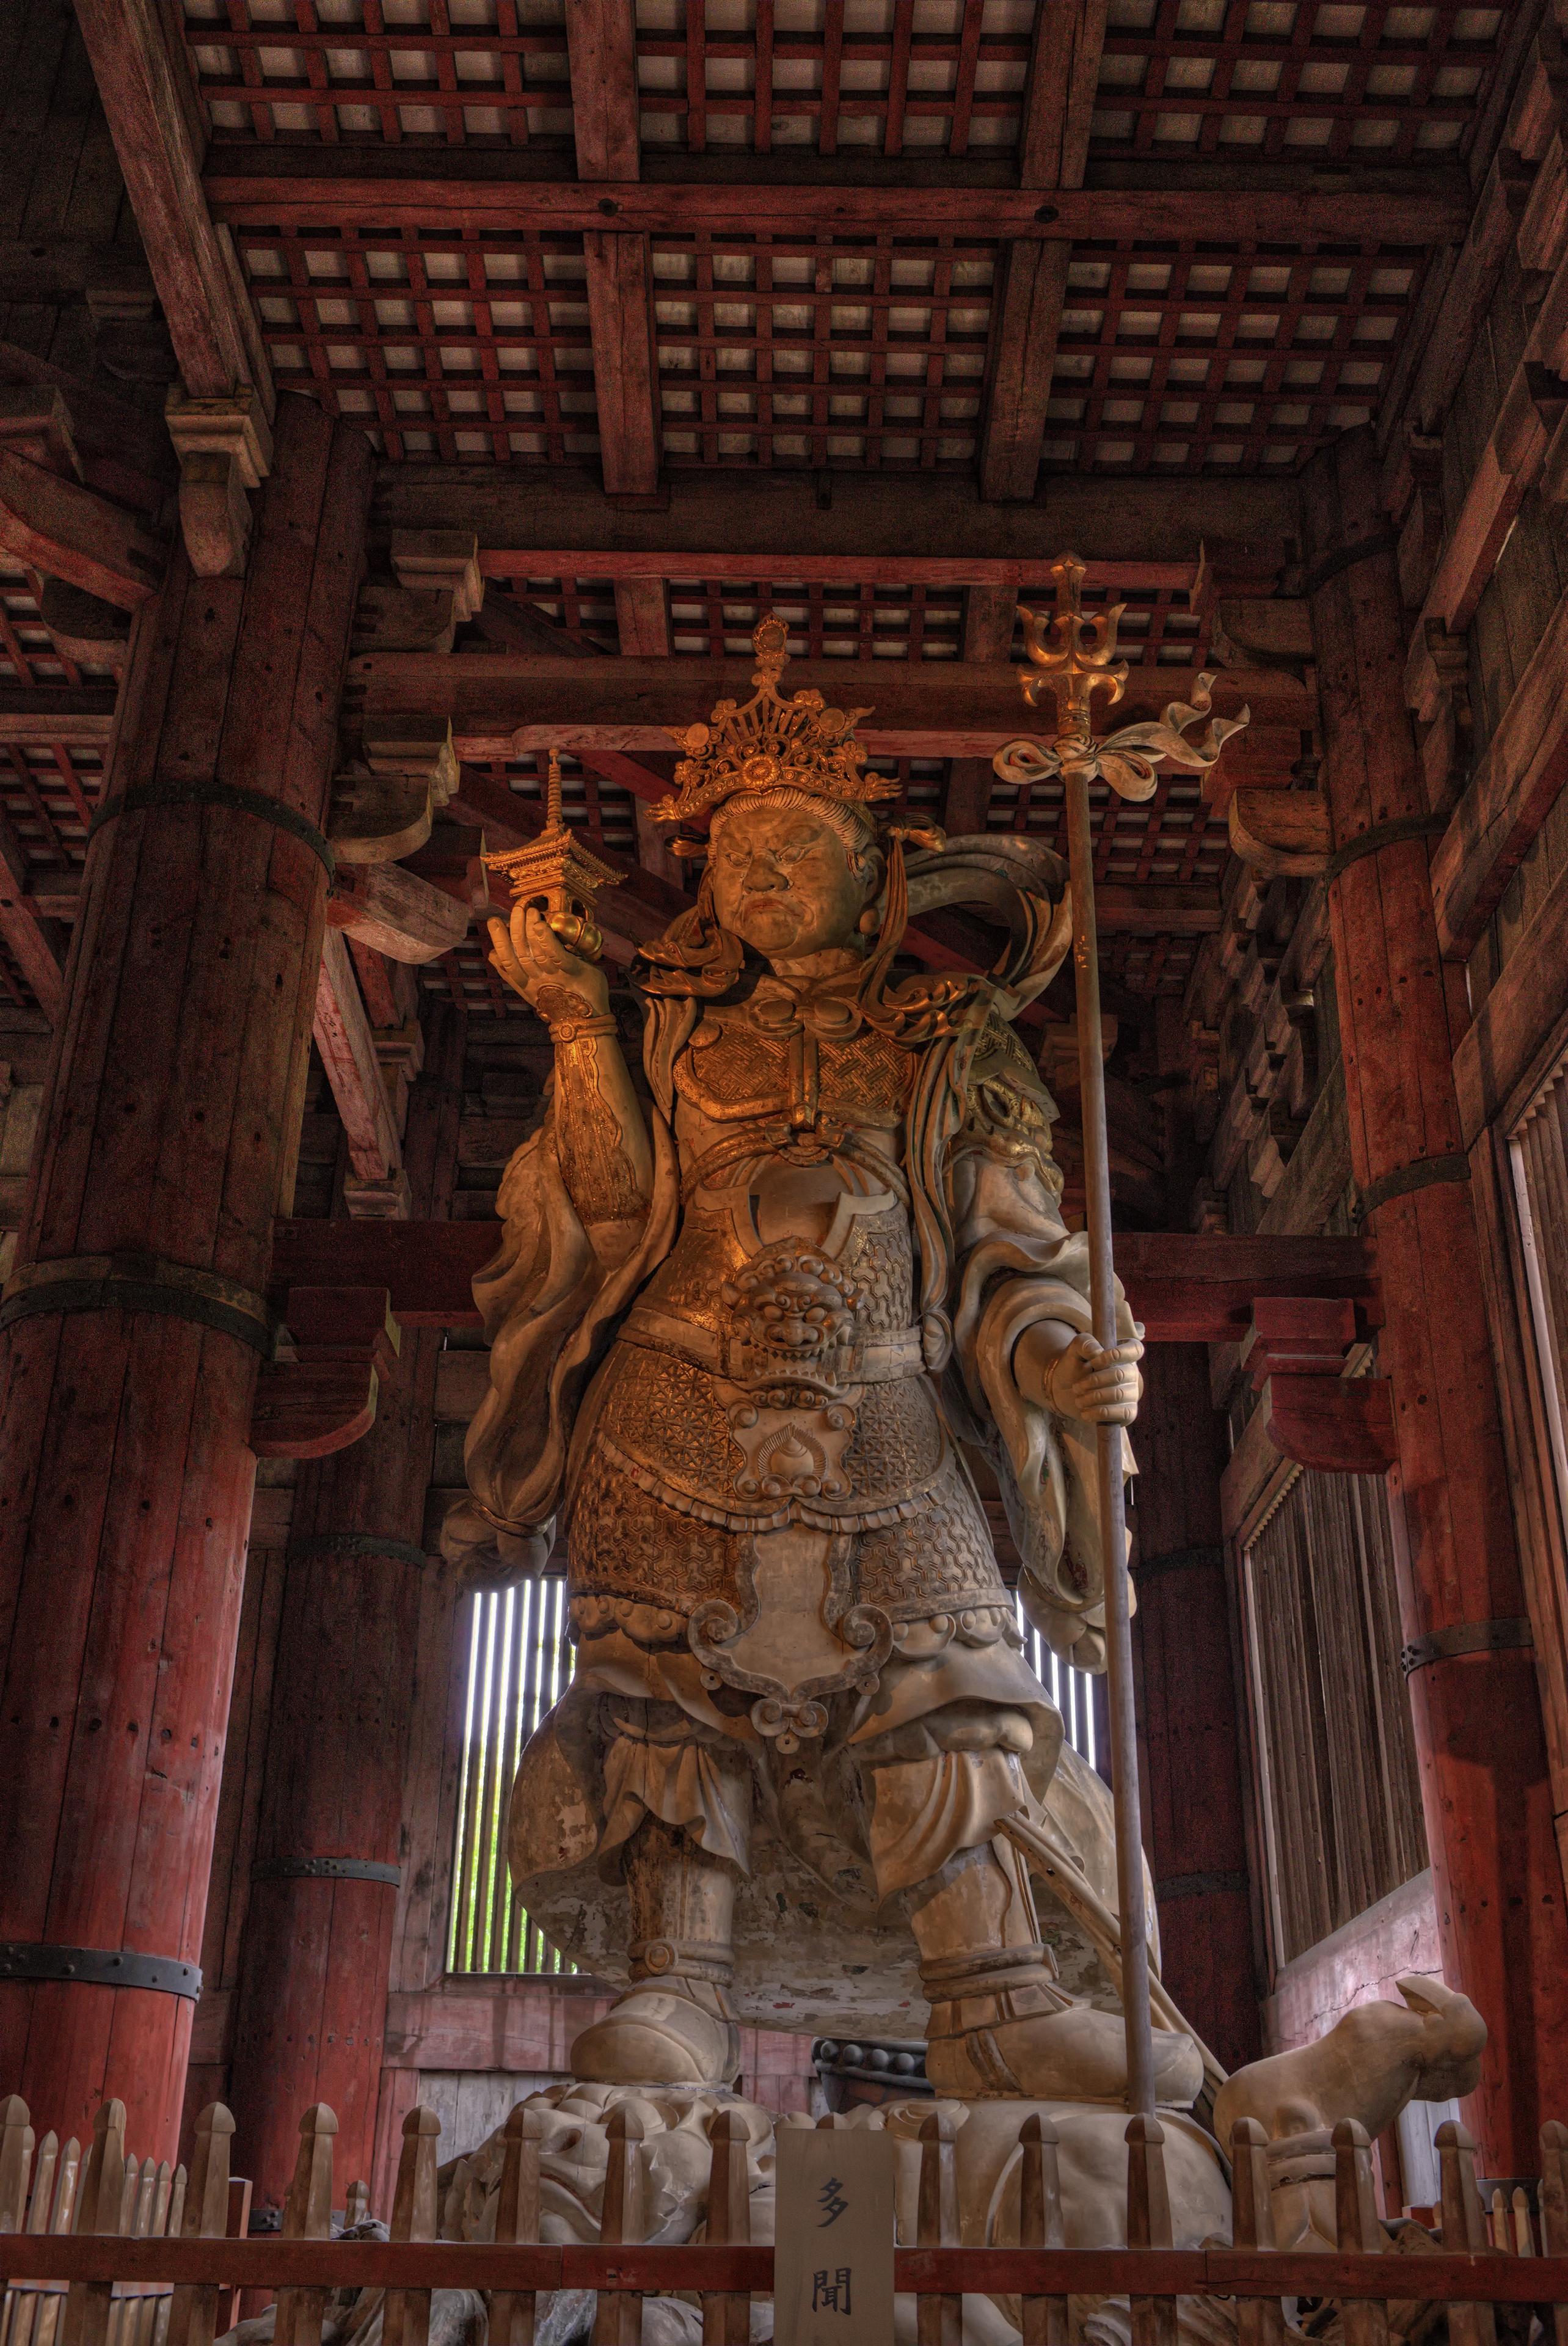 Komokuten statue in Daibutsu-den Todai-ji temple